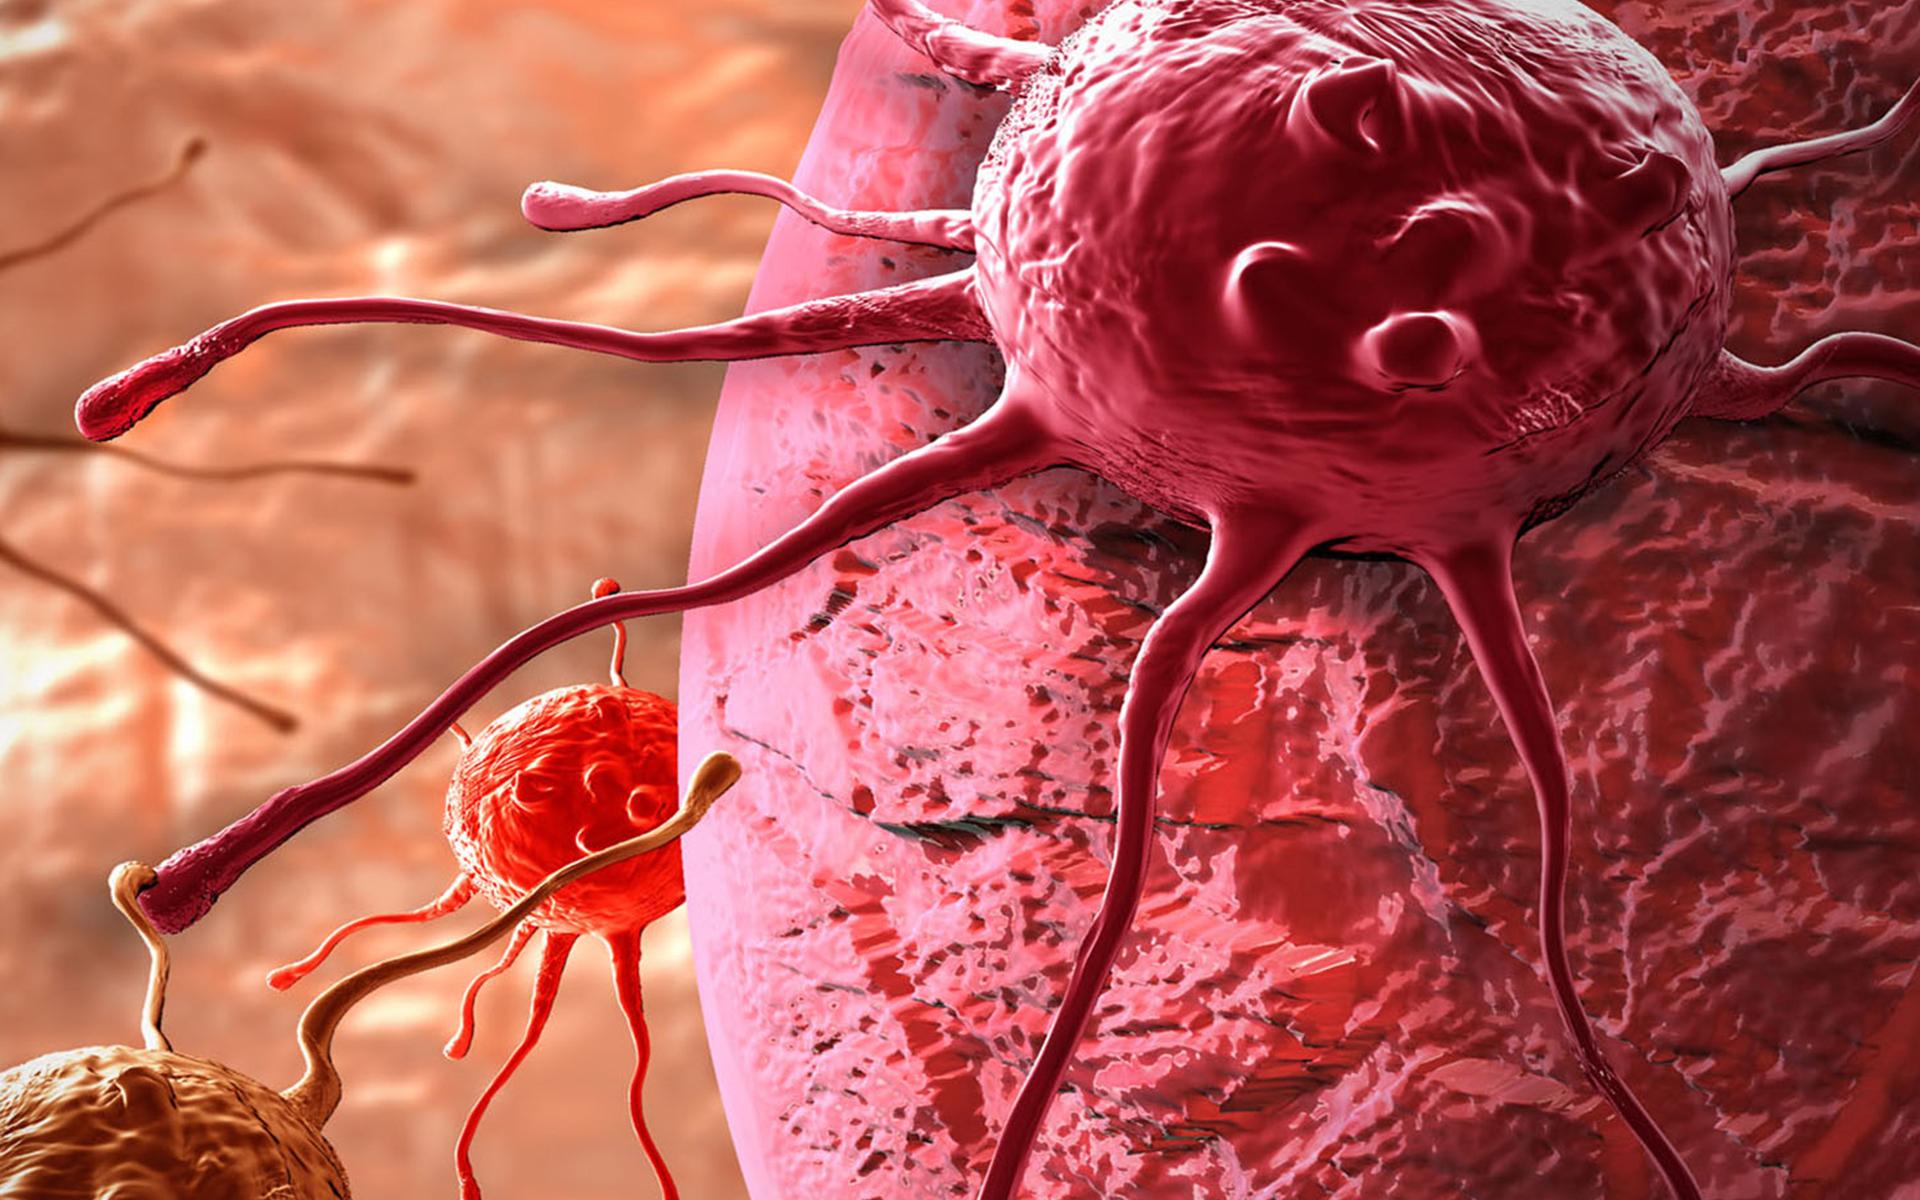 cum poti afla rapid daca ai cancer depistat australieni